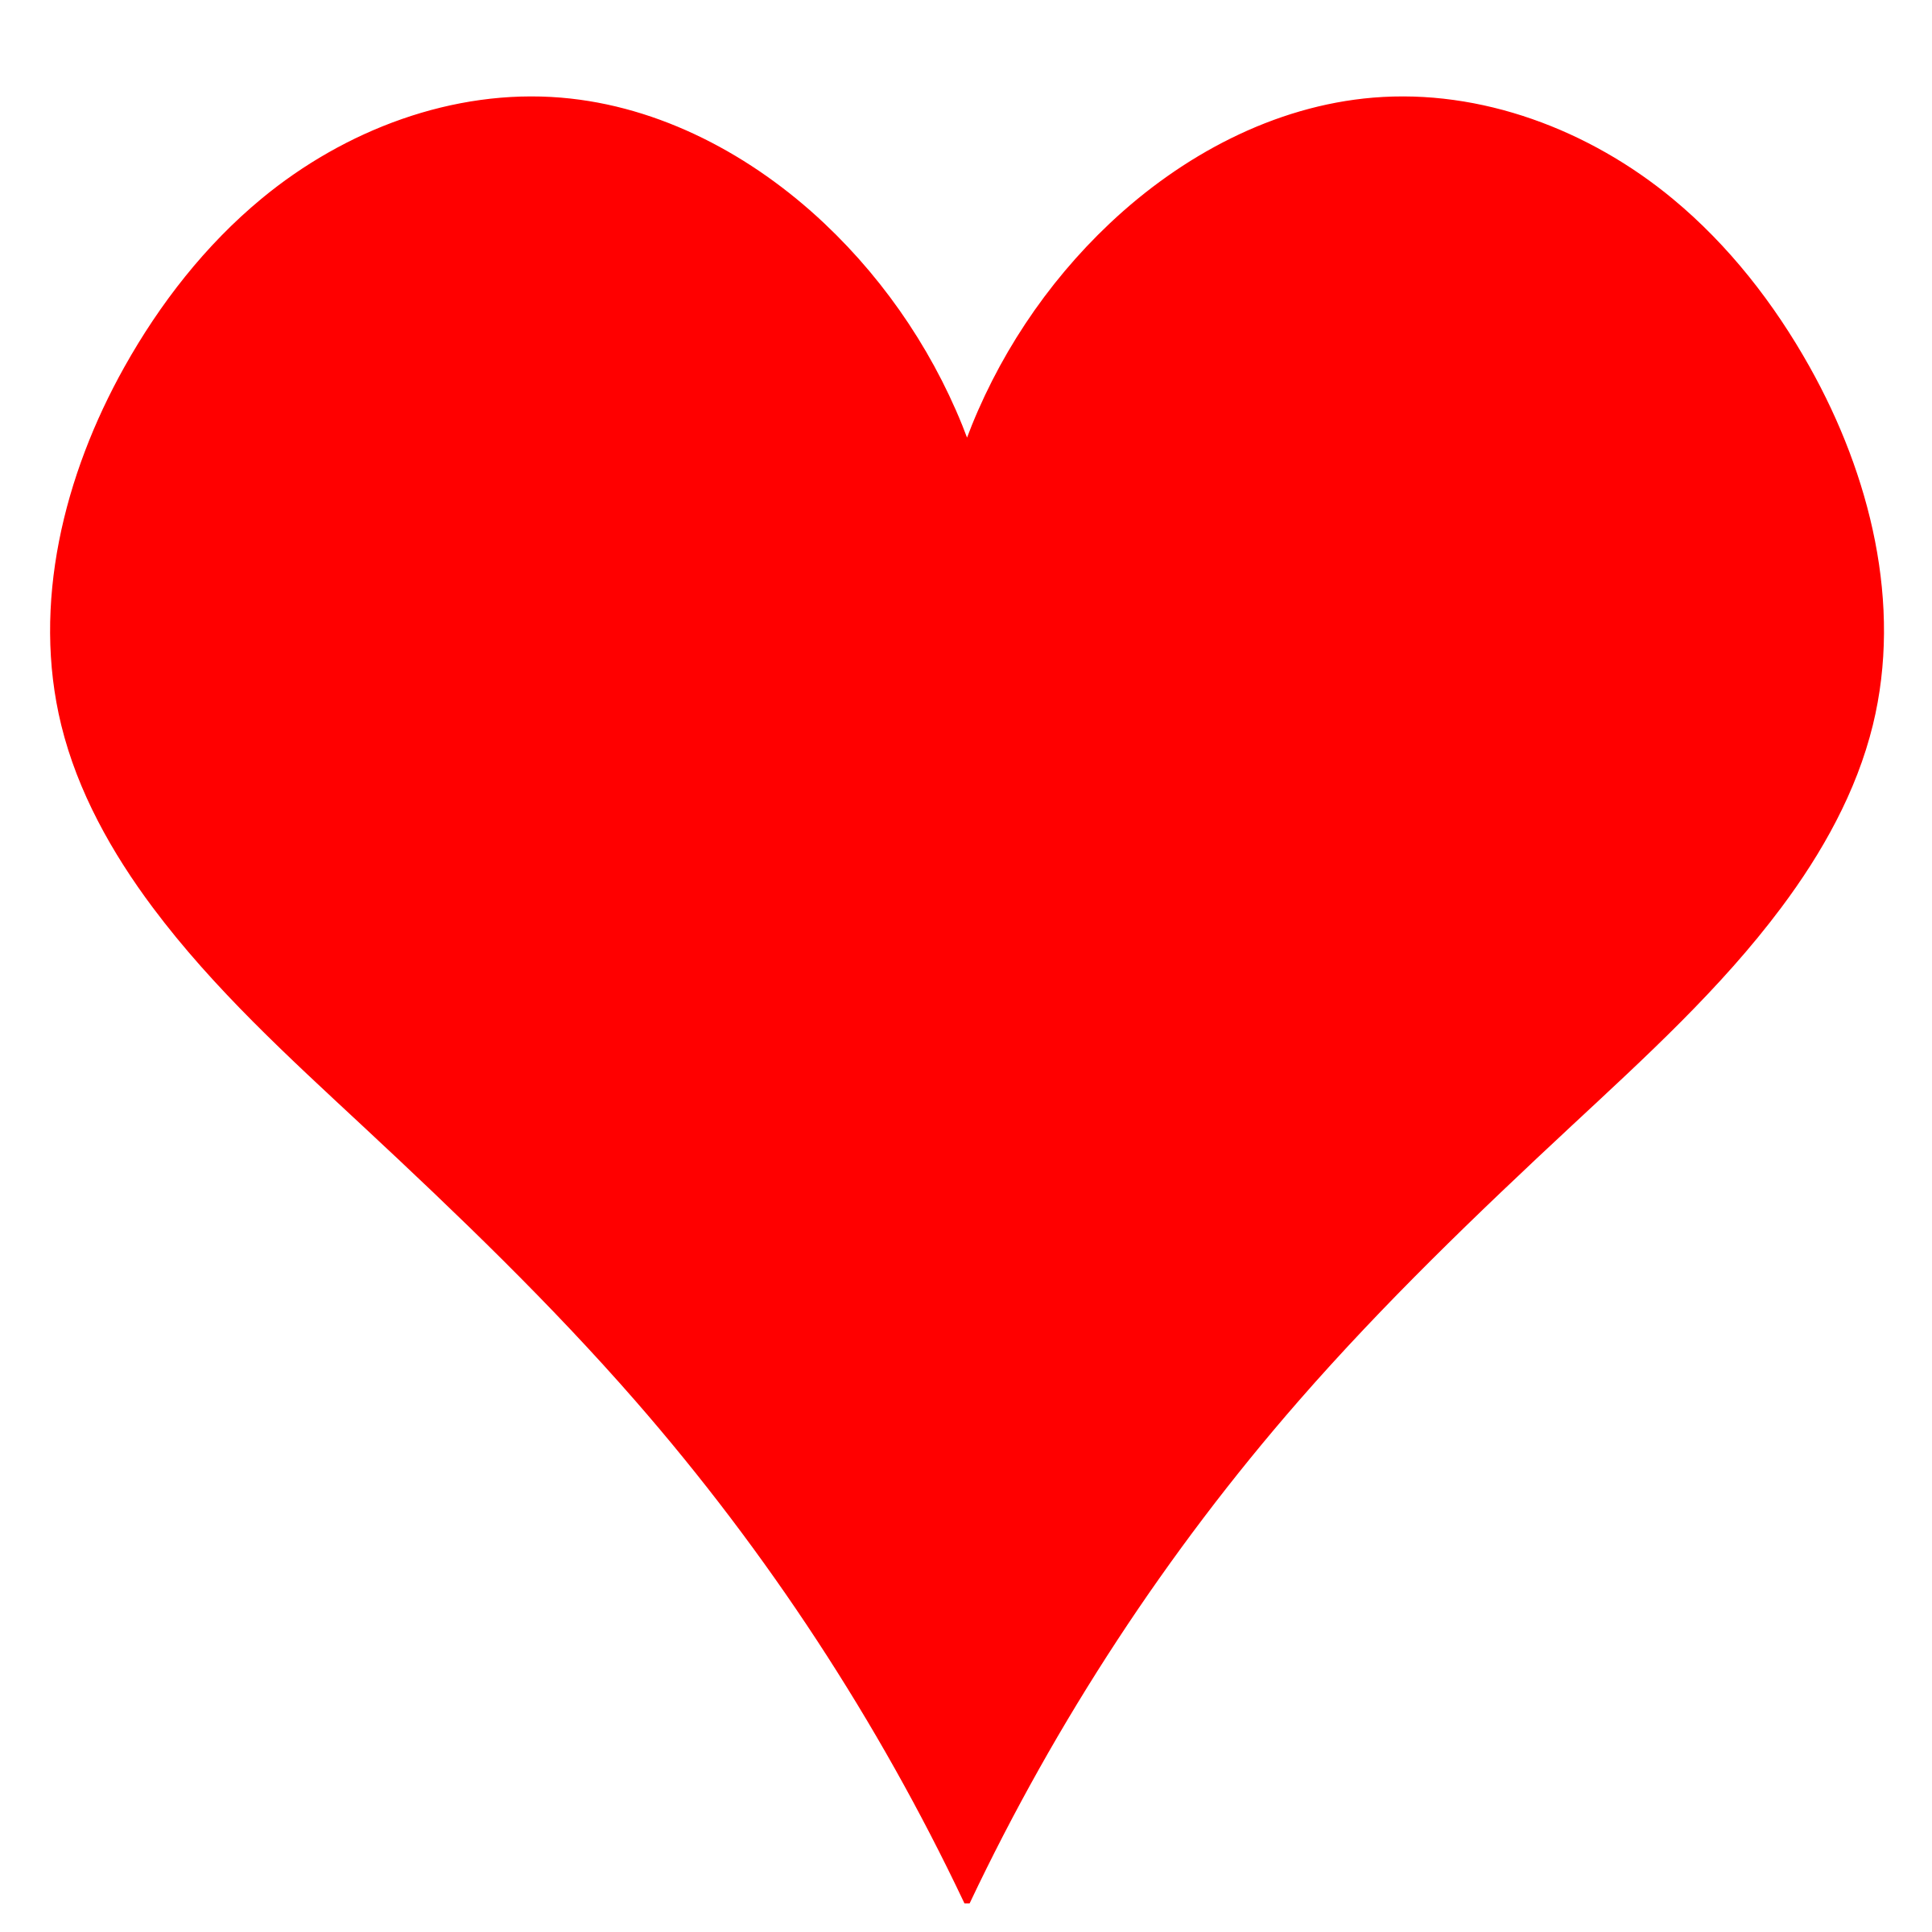 Artificial heart clipart jpg freeuse Artificial Heart Clipart - 2018 Clipart Gallery jpg freeuse